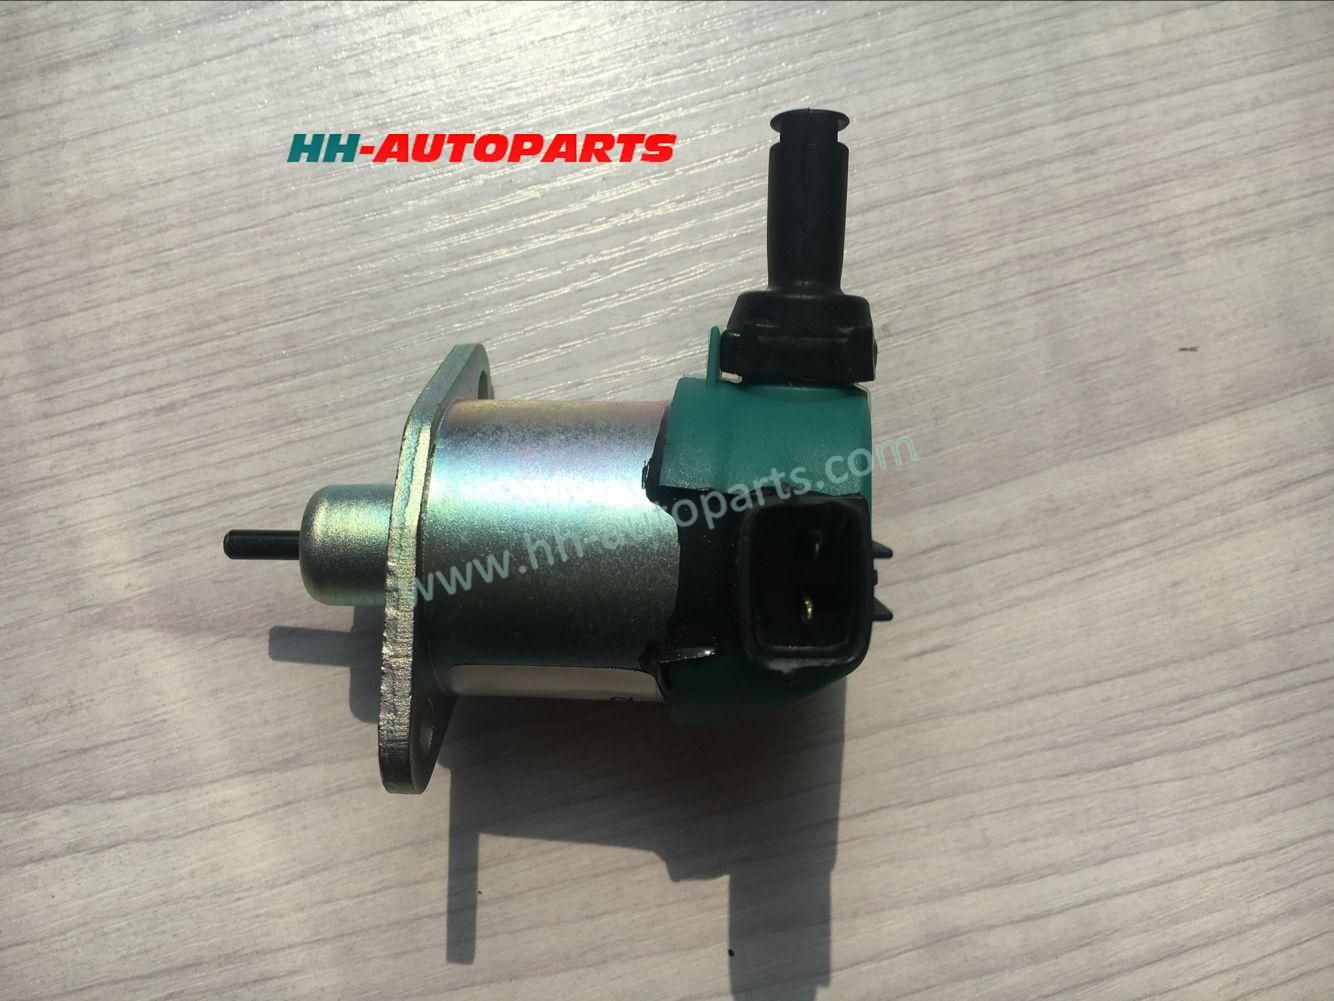 Kubota Fuel Shut off Solenoid 17208-60015 12V | Engine Stop